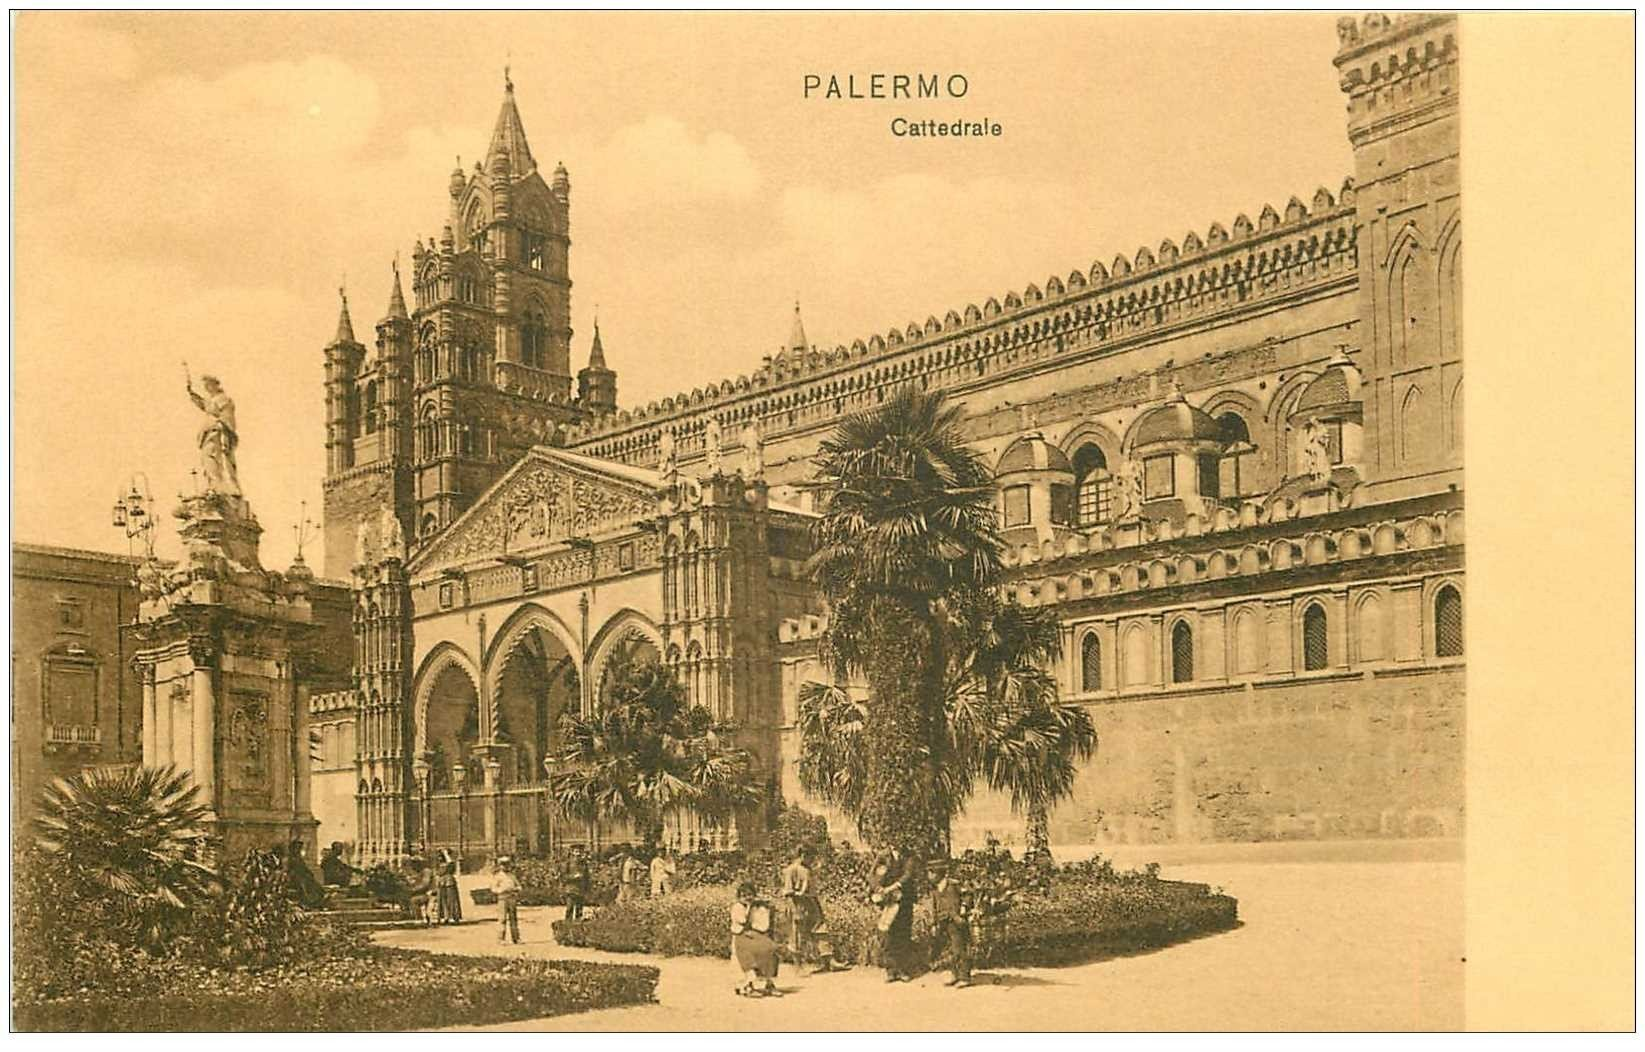 carte postale ancienne Italia. PALERMO Cattedrale animation